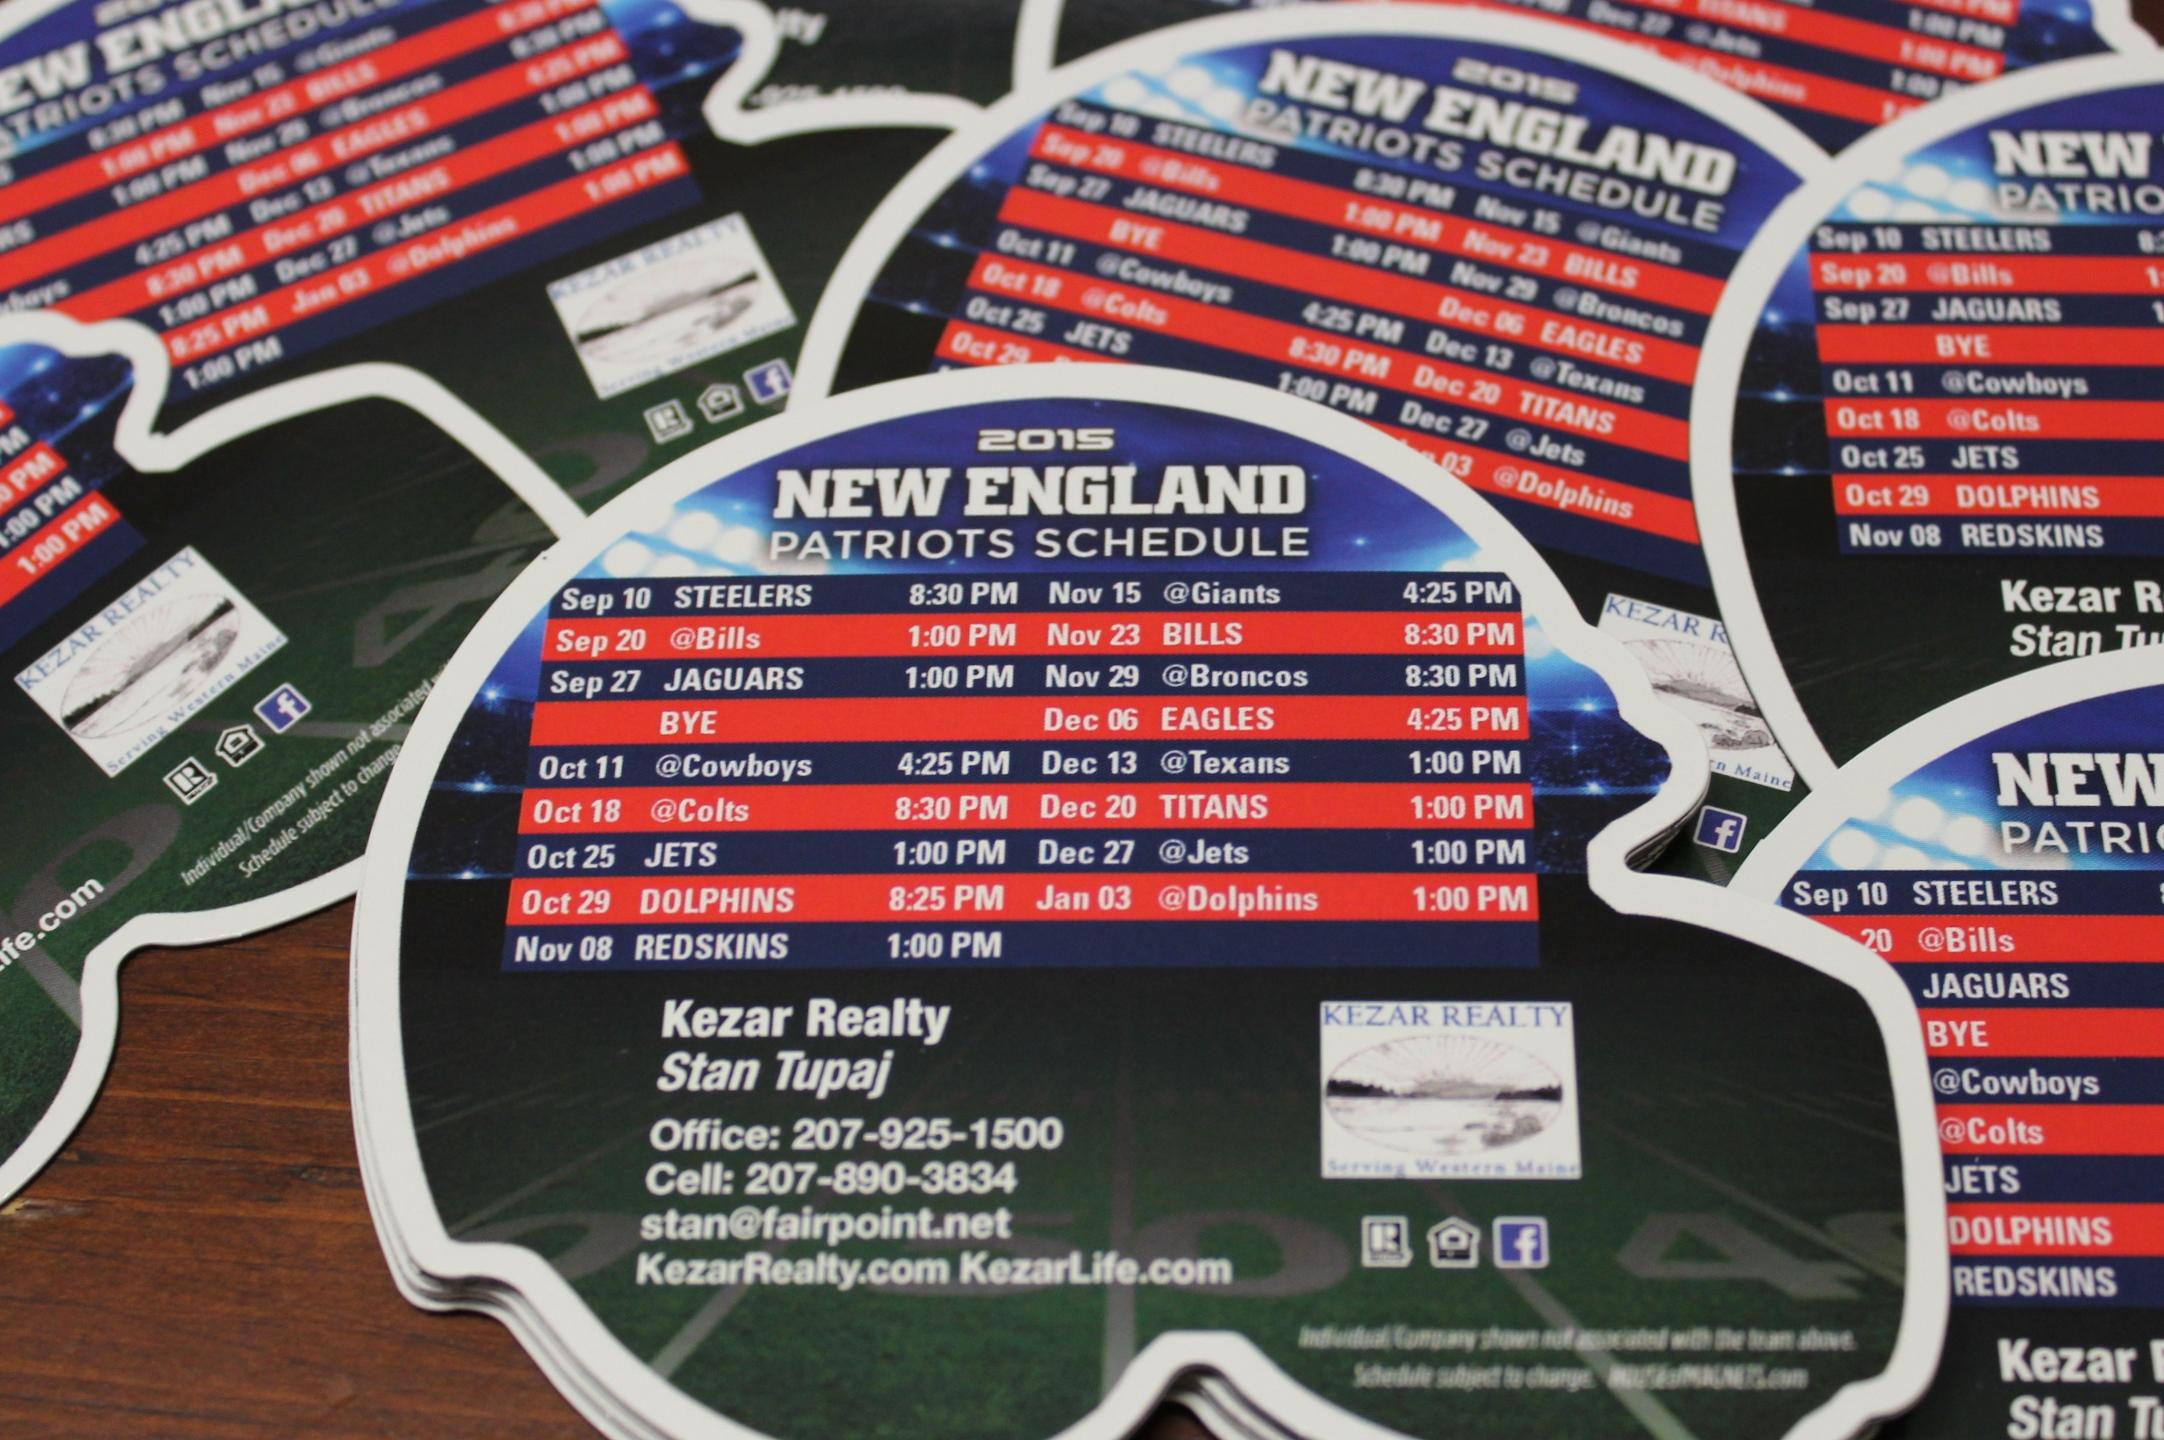 2015 new england patriots schedule magnets kezarlife s blog